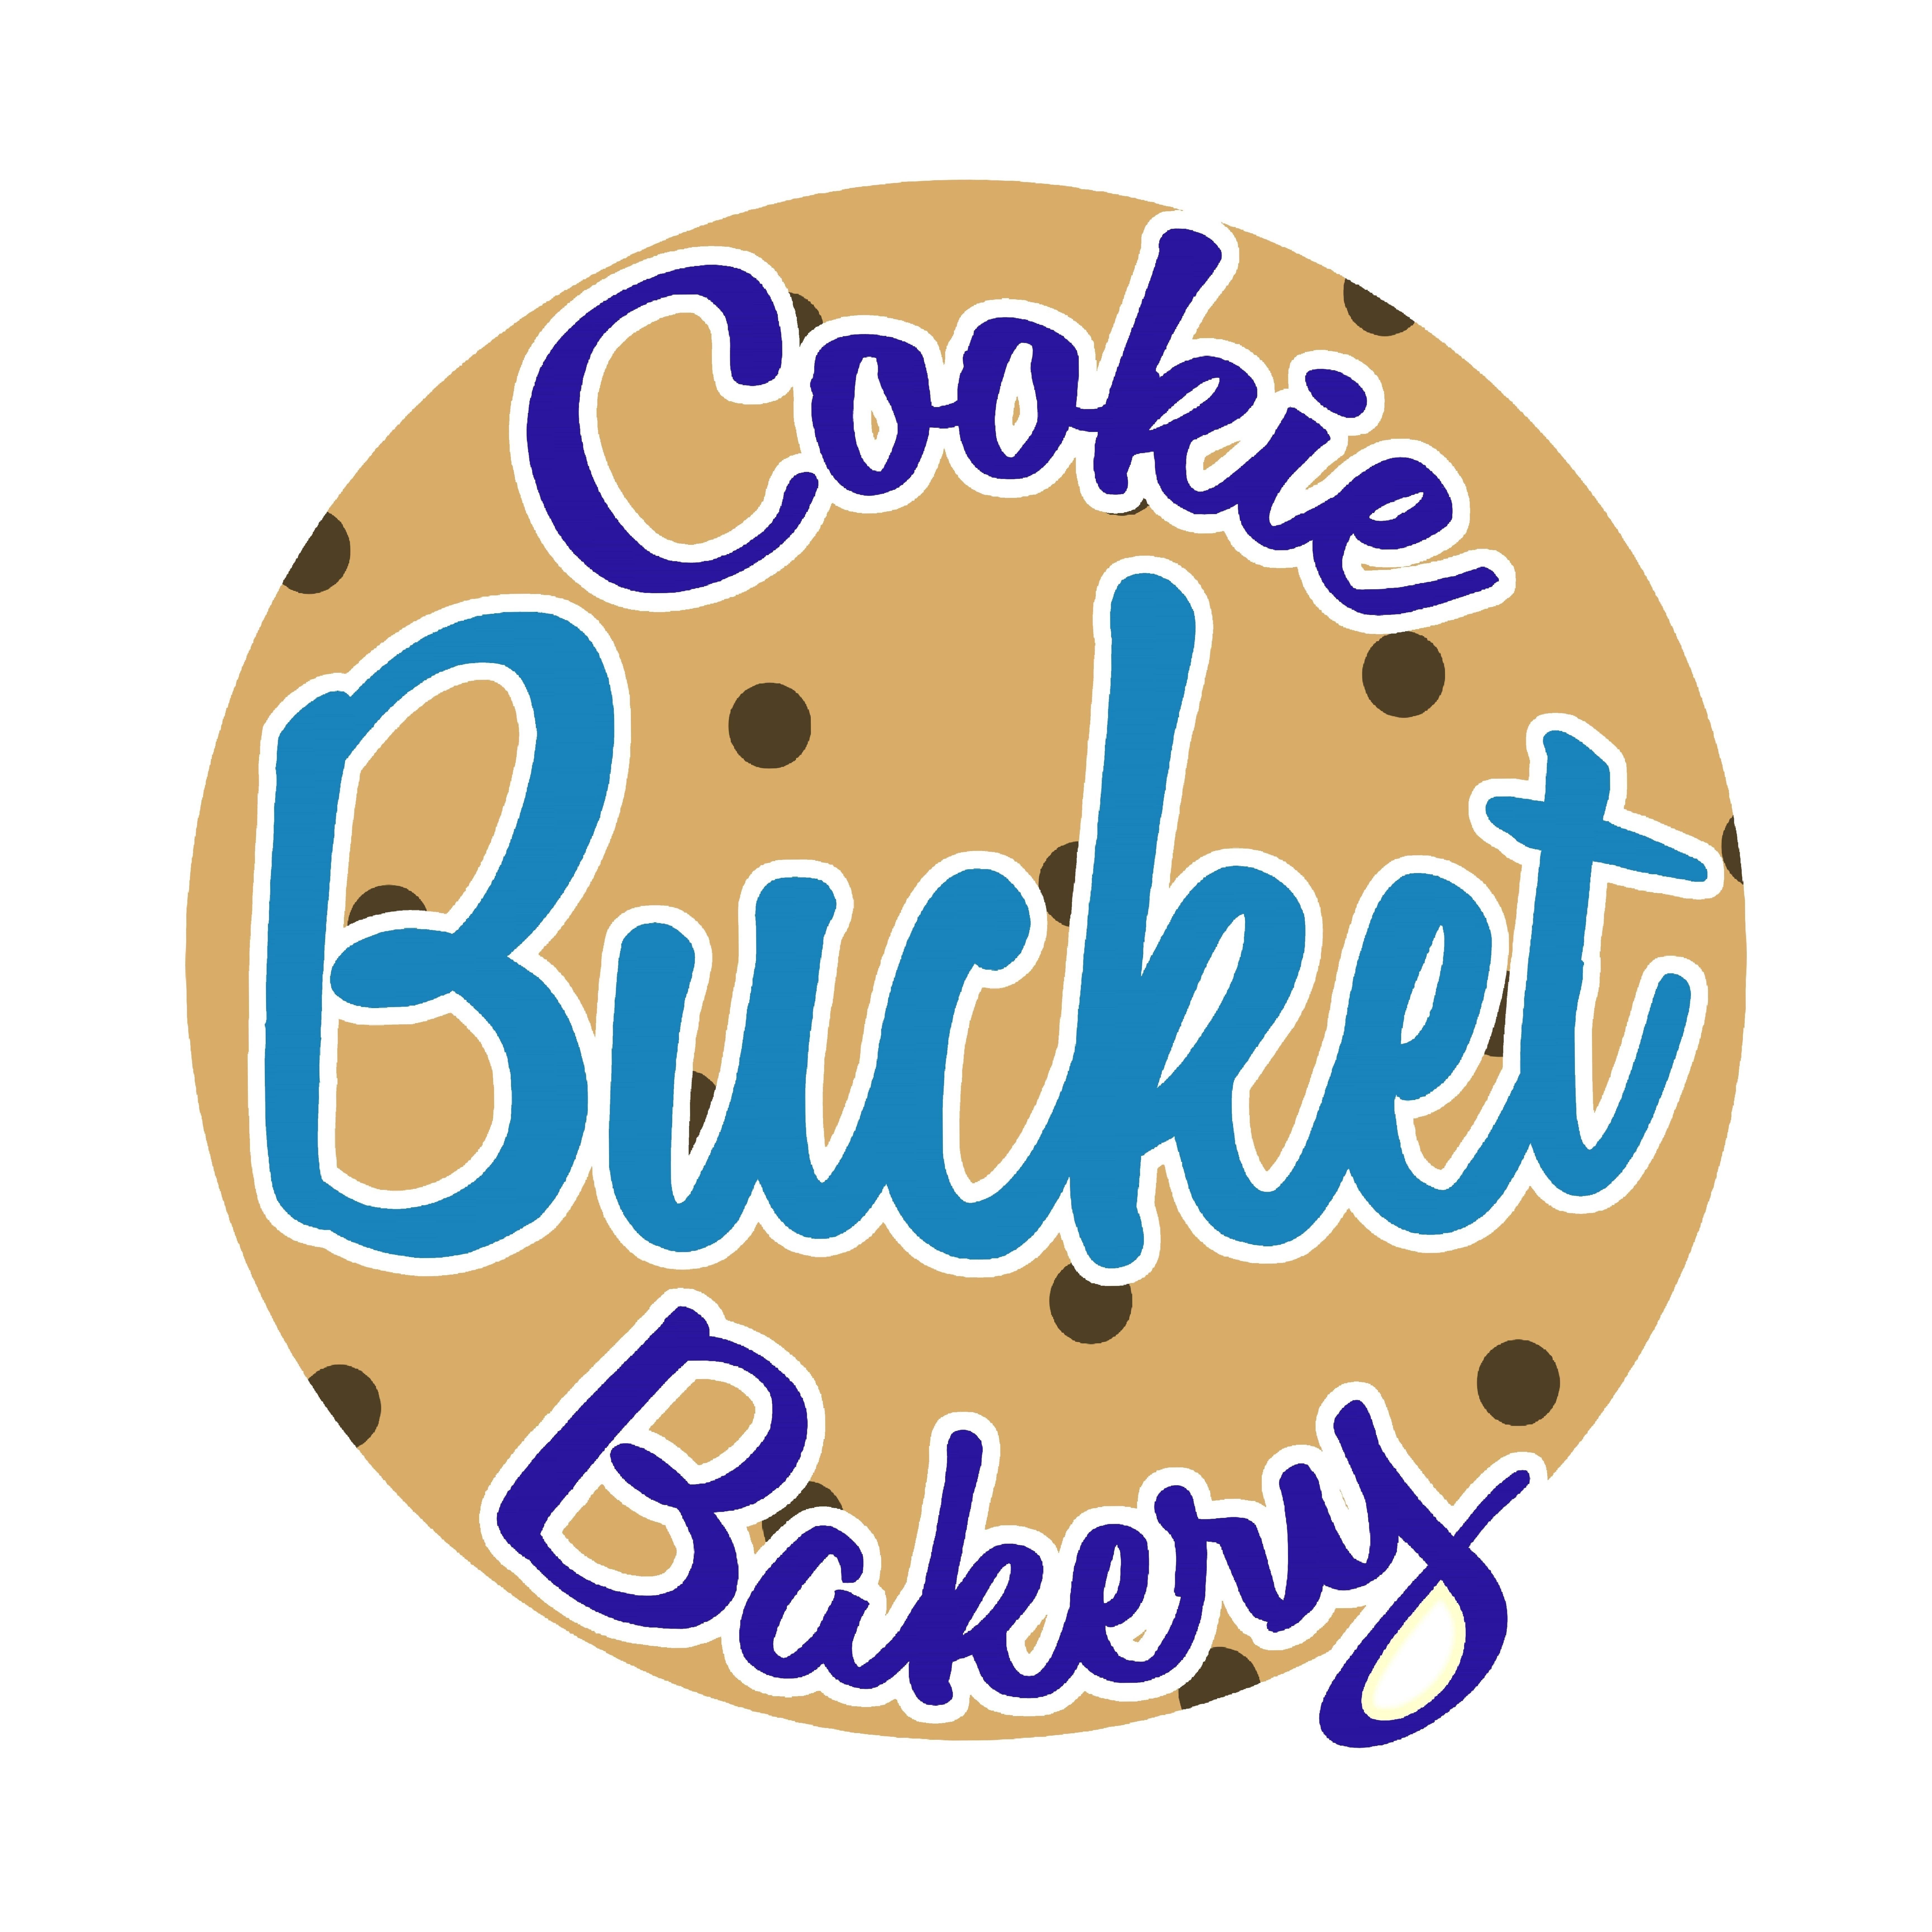 Cookie Bucket Bakery LLC